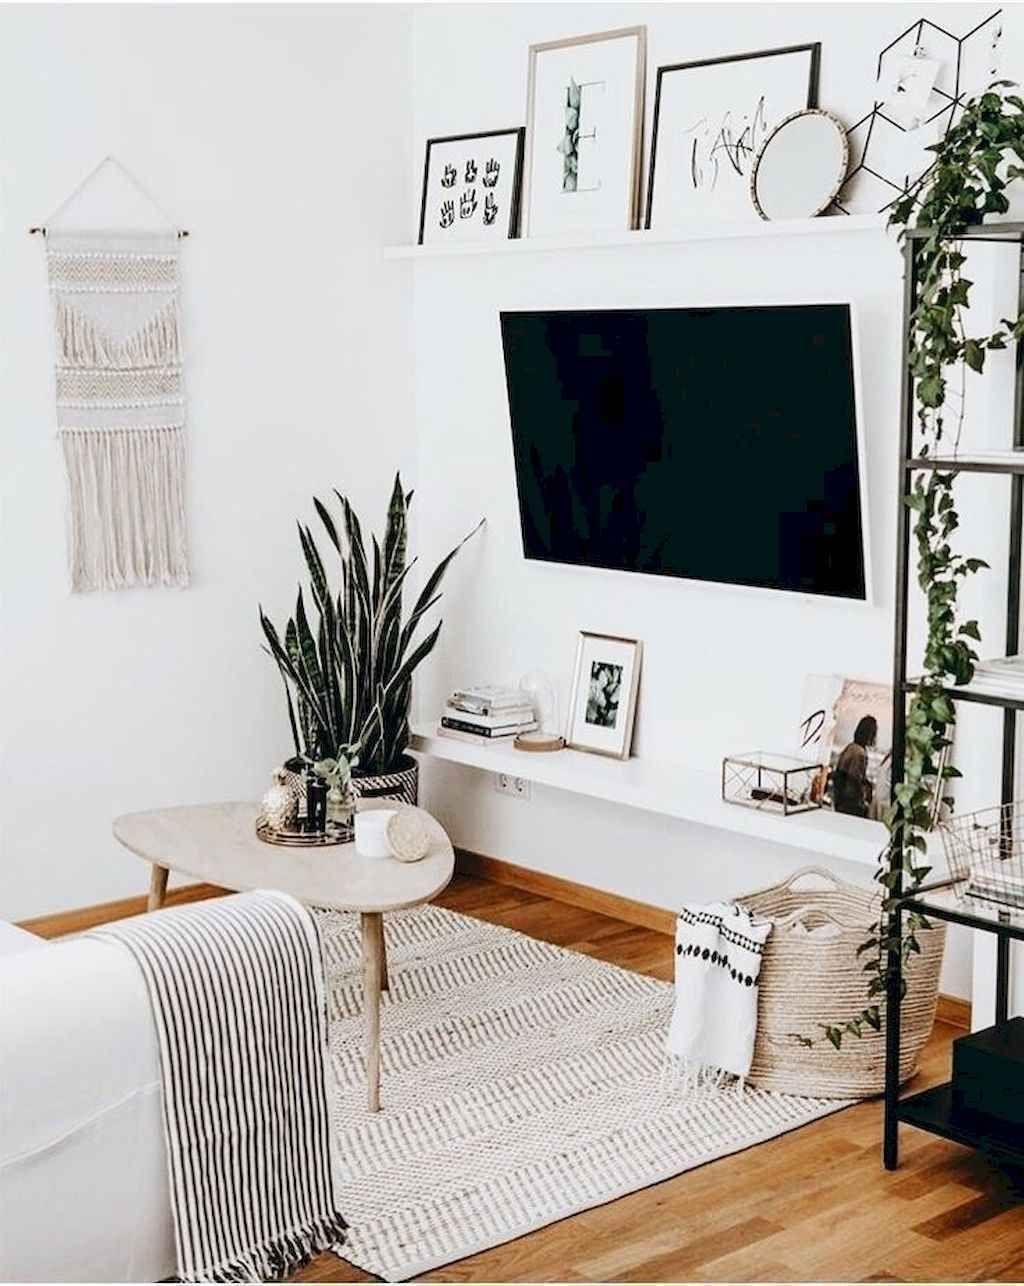 01 Apartment Living Room Decorating Ideas #smallapartmentlivingroom